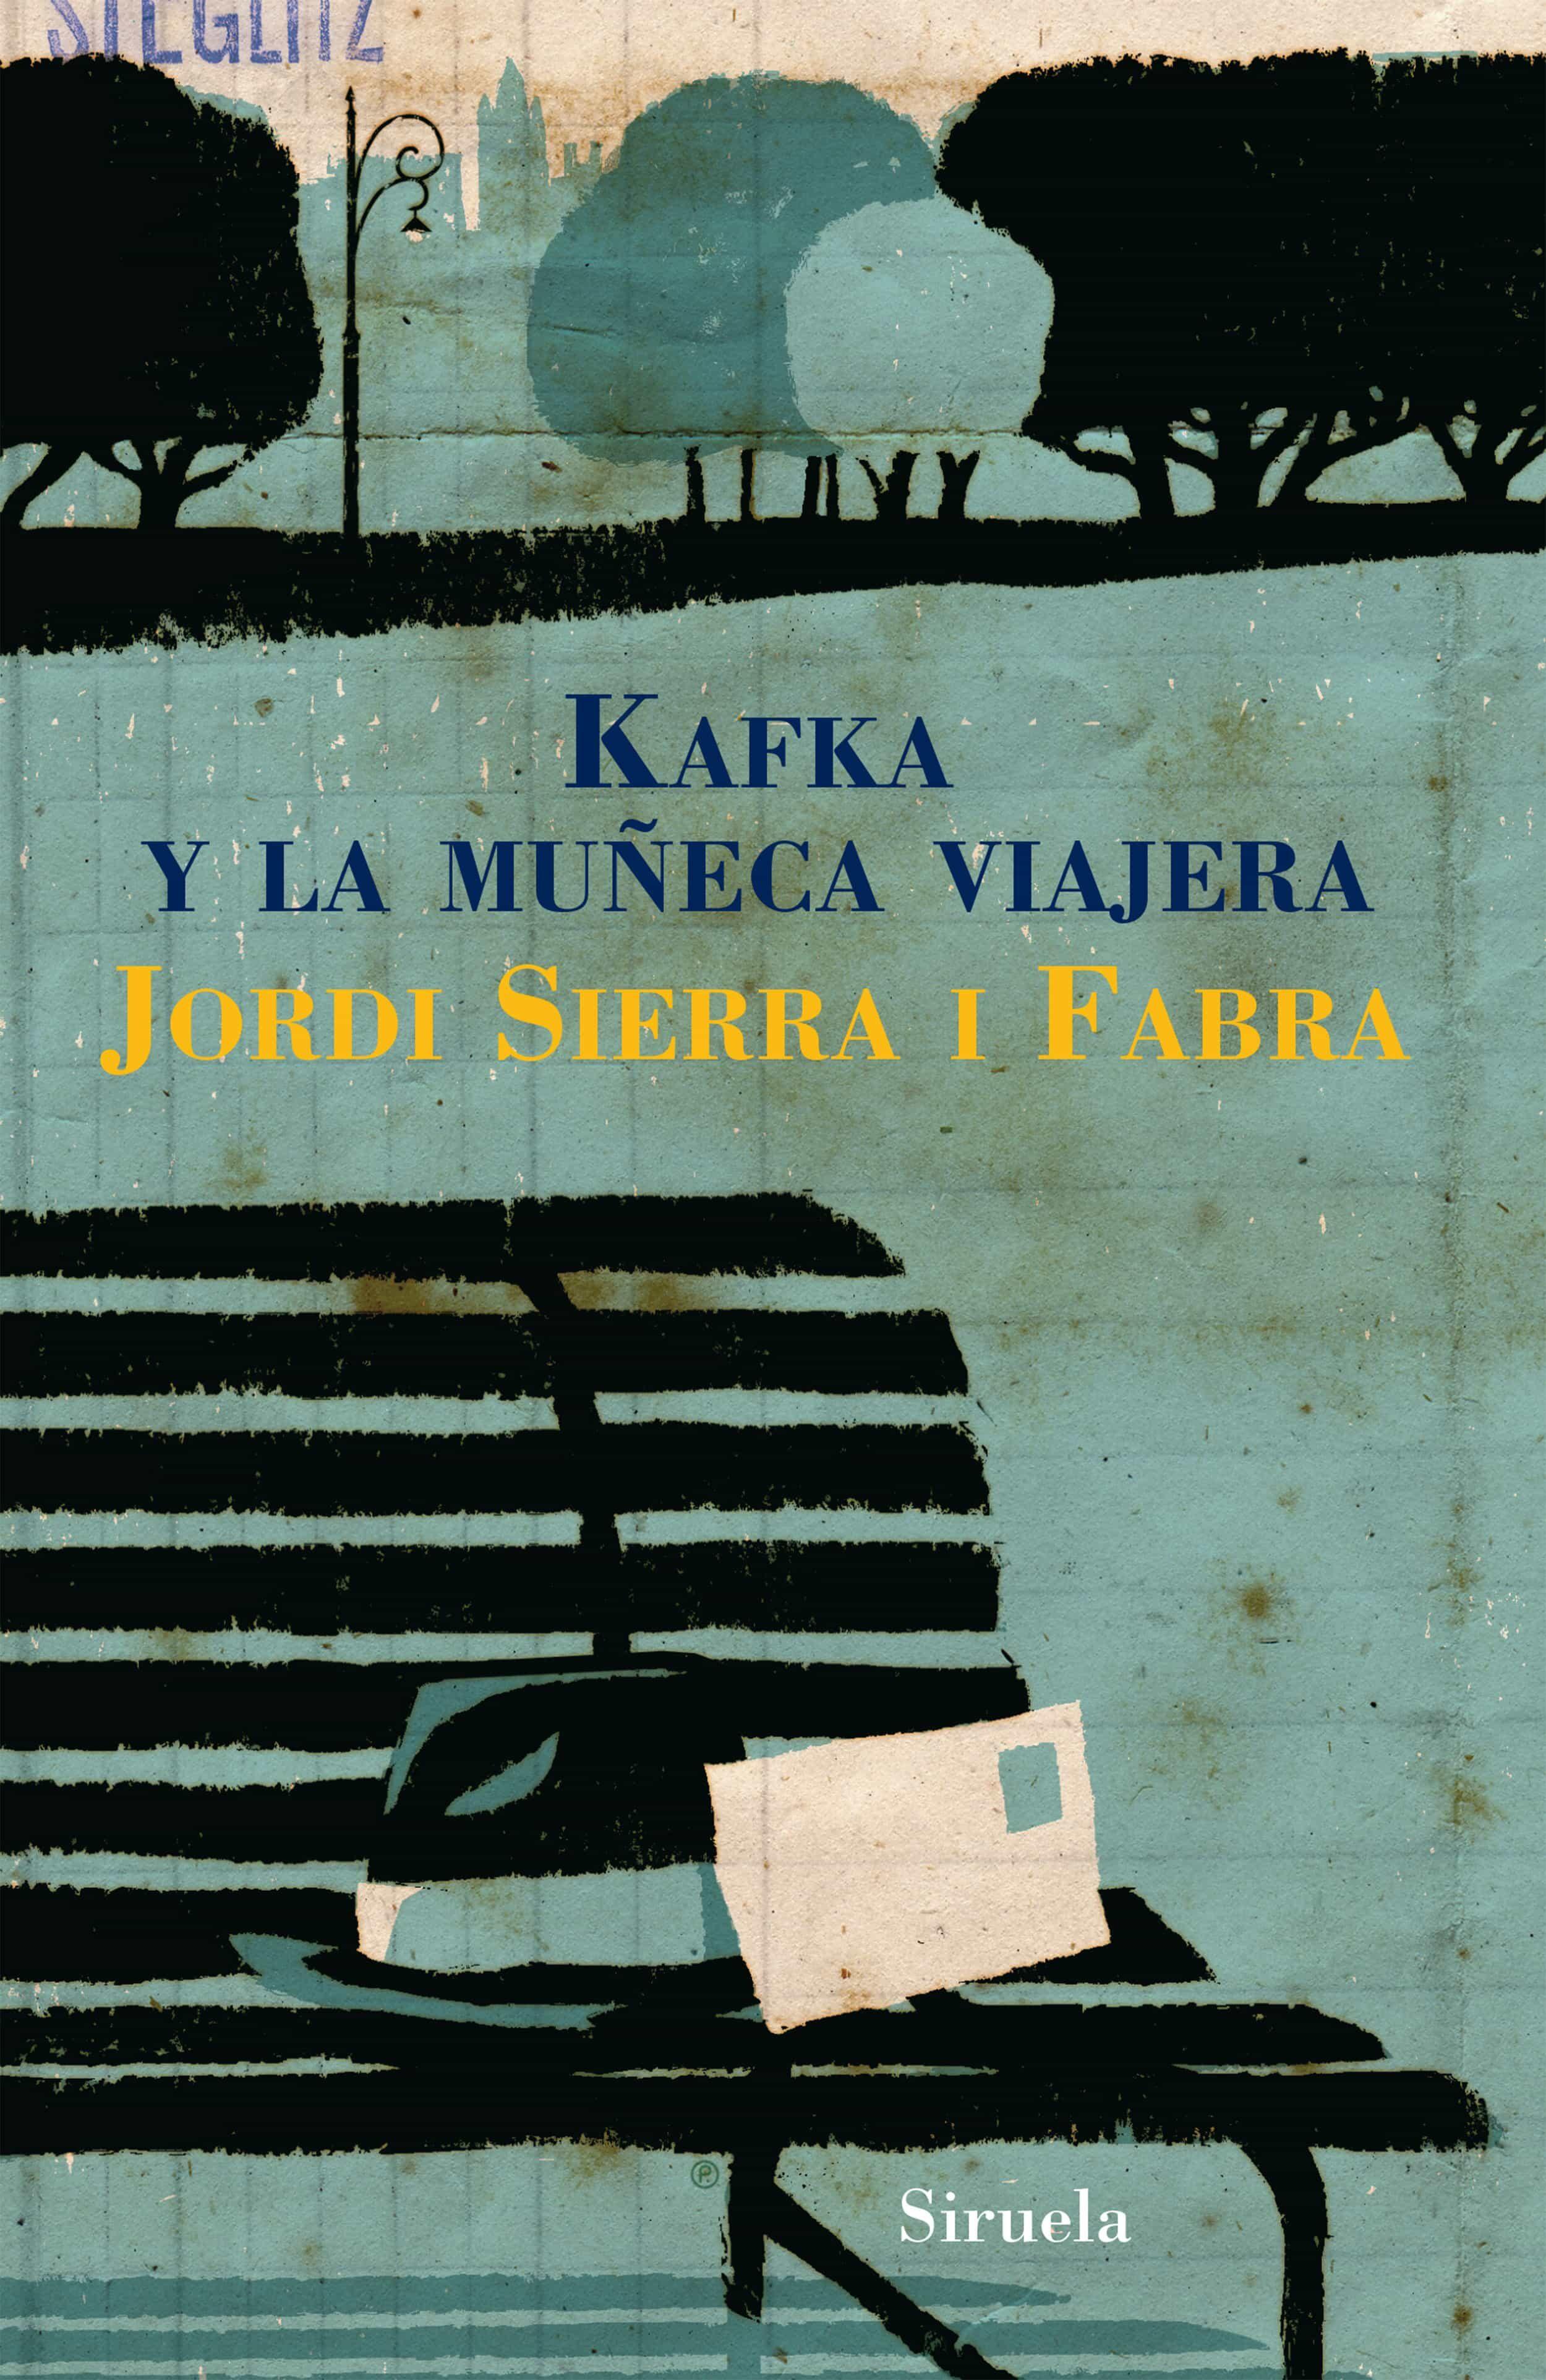 kafka y la muñeca viajera-jordi sierra i fabra-9788498411164